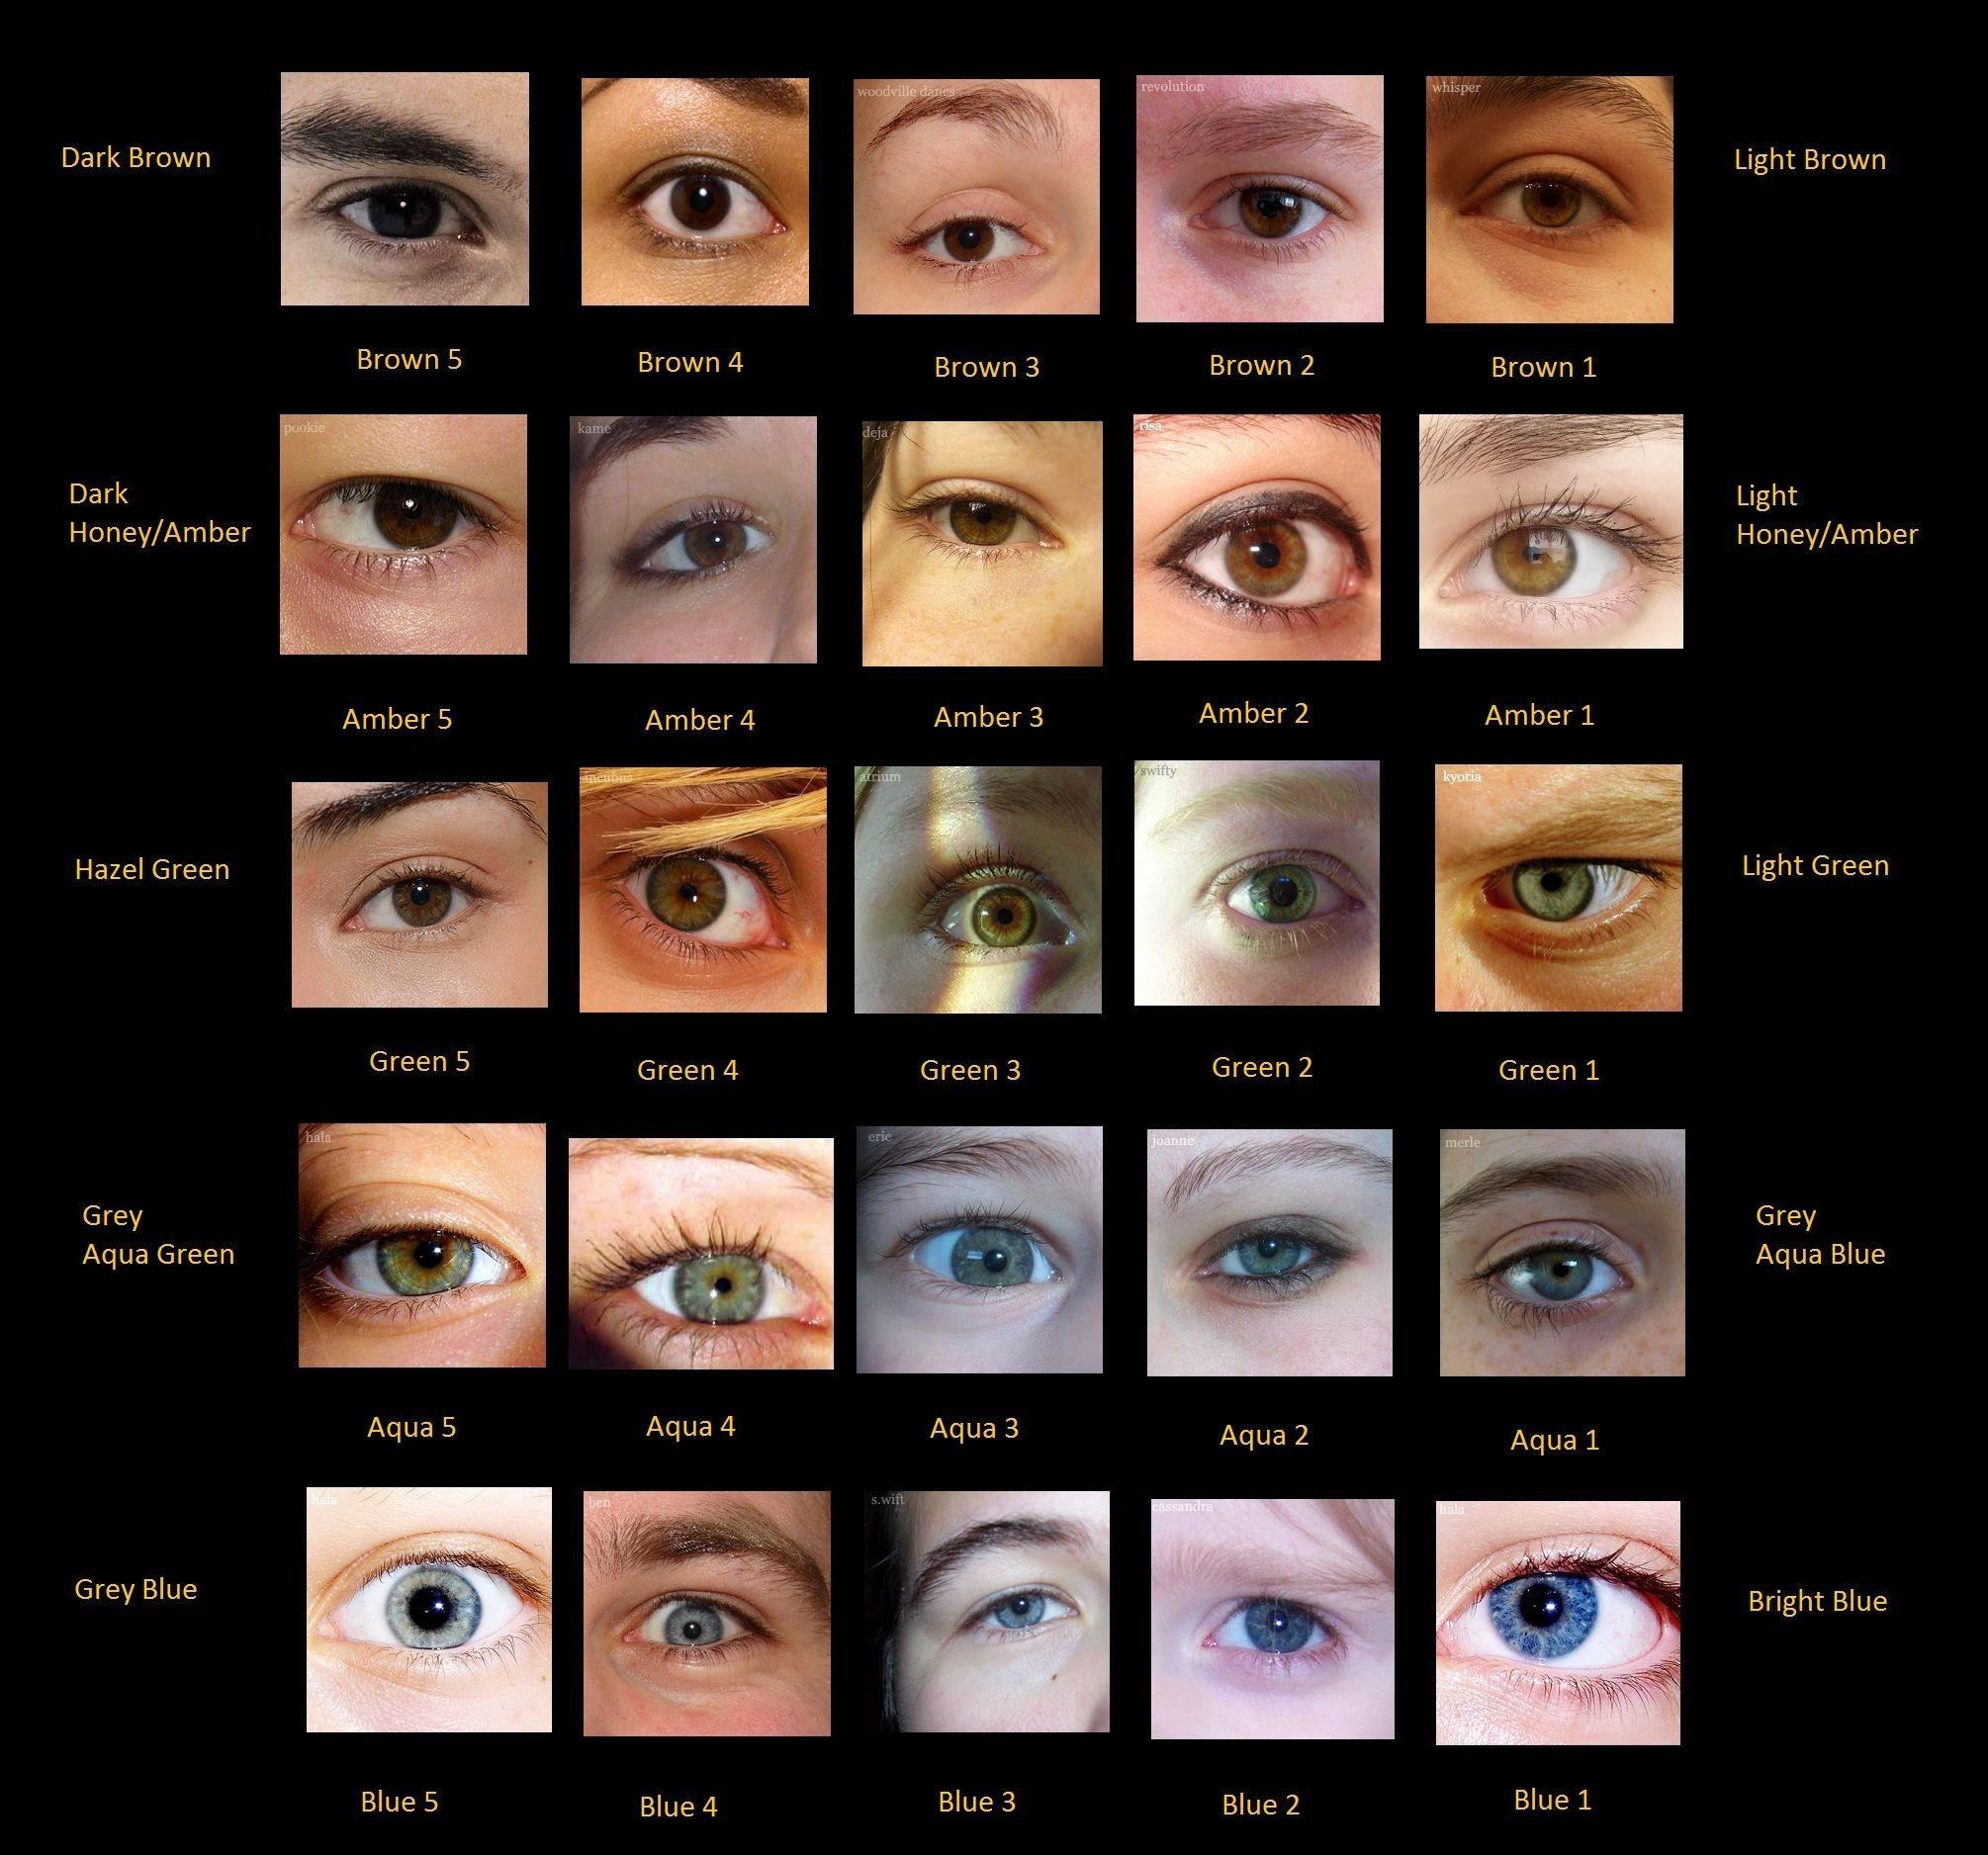 Imgur post imgur writing ideasstorytelling pinterest eye eye nvjuhfo Choice Image